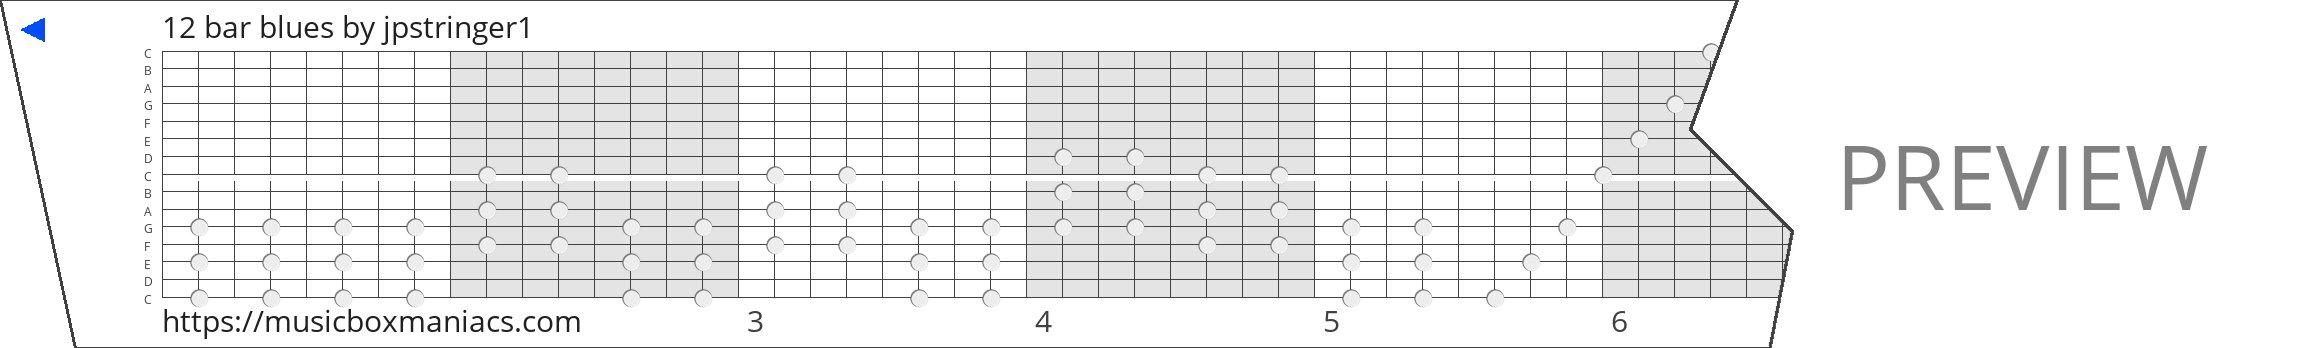 12 bar blues 15 note music box paper strip